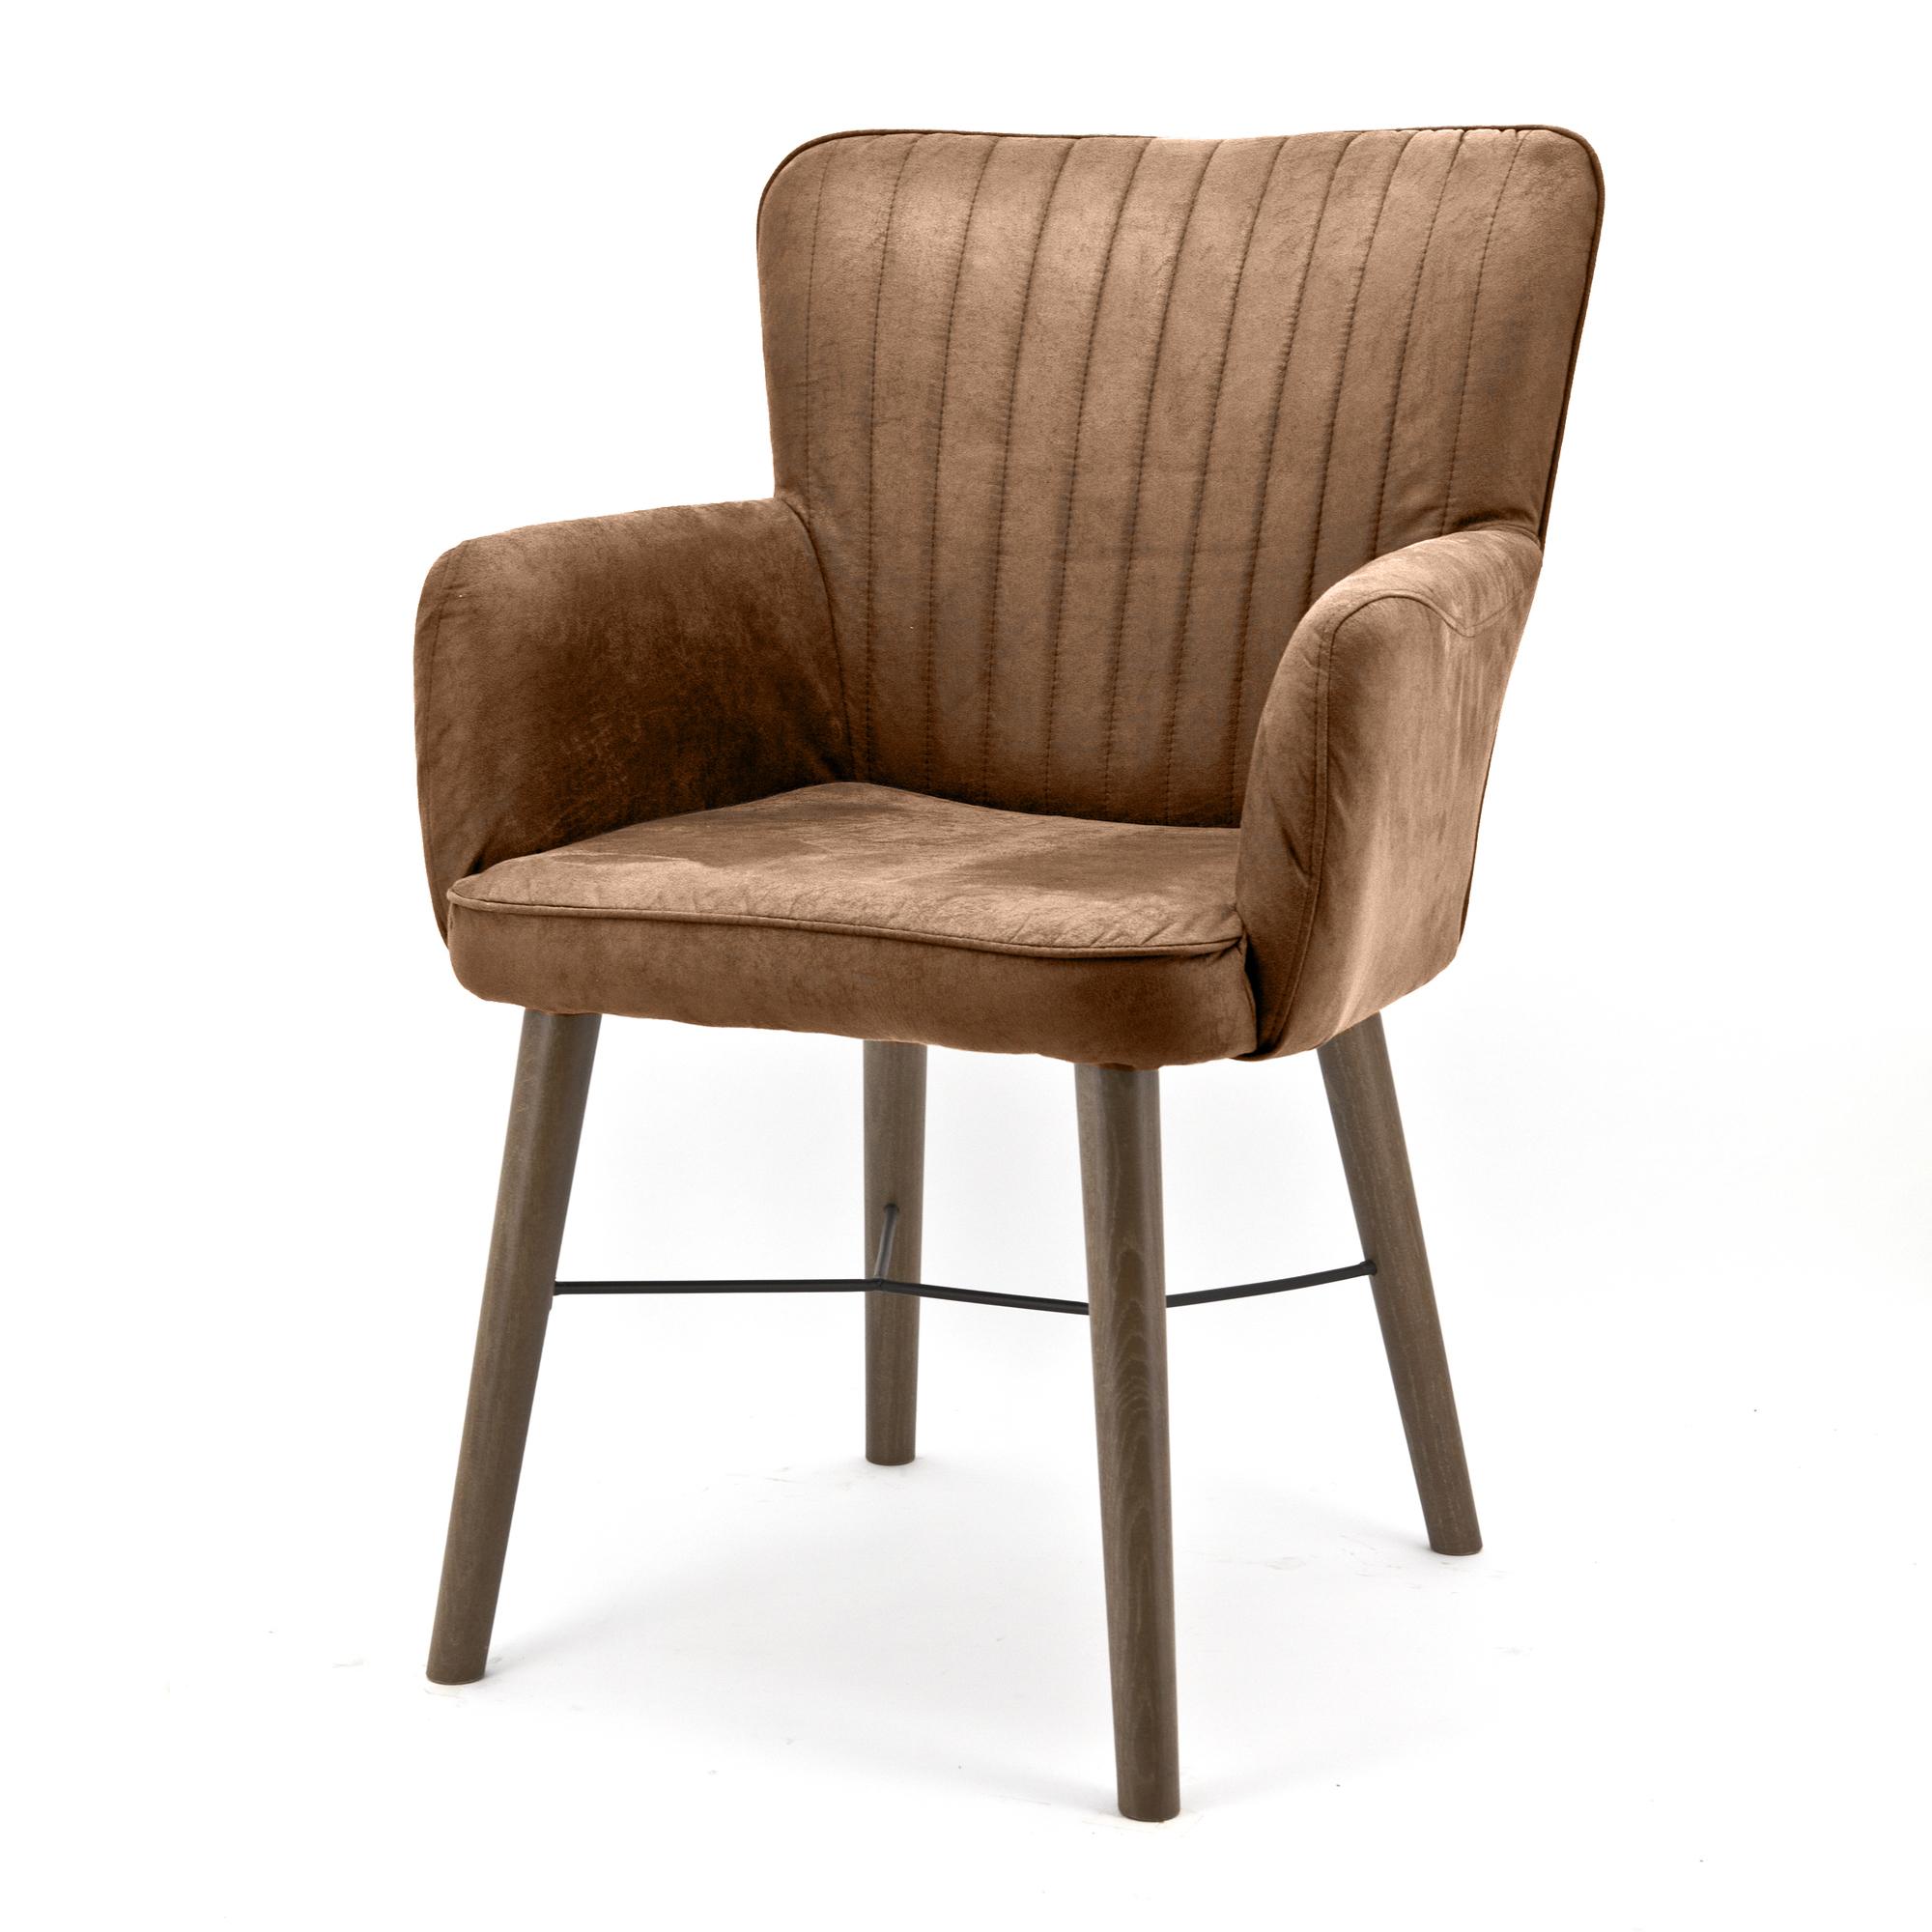 stoel-chiba-armleuning-eleonora-90155-cognac